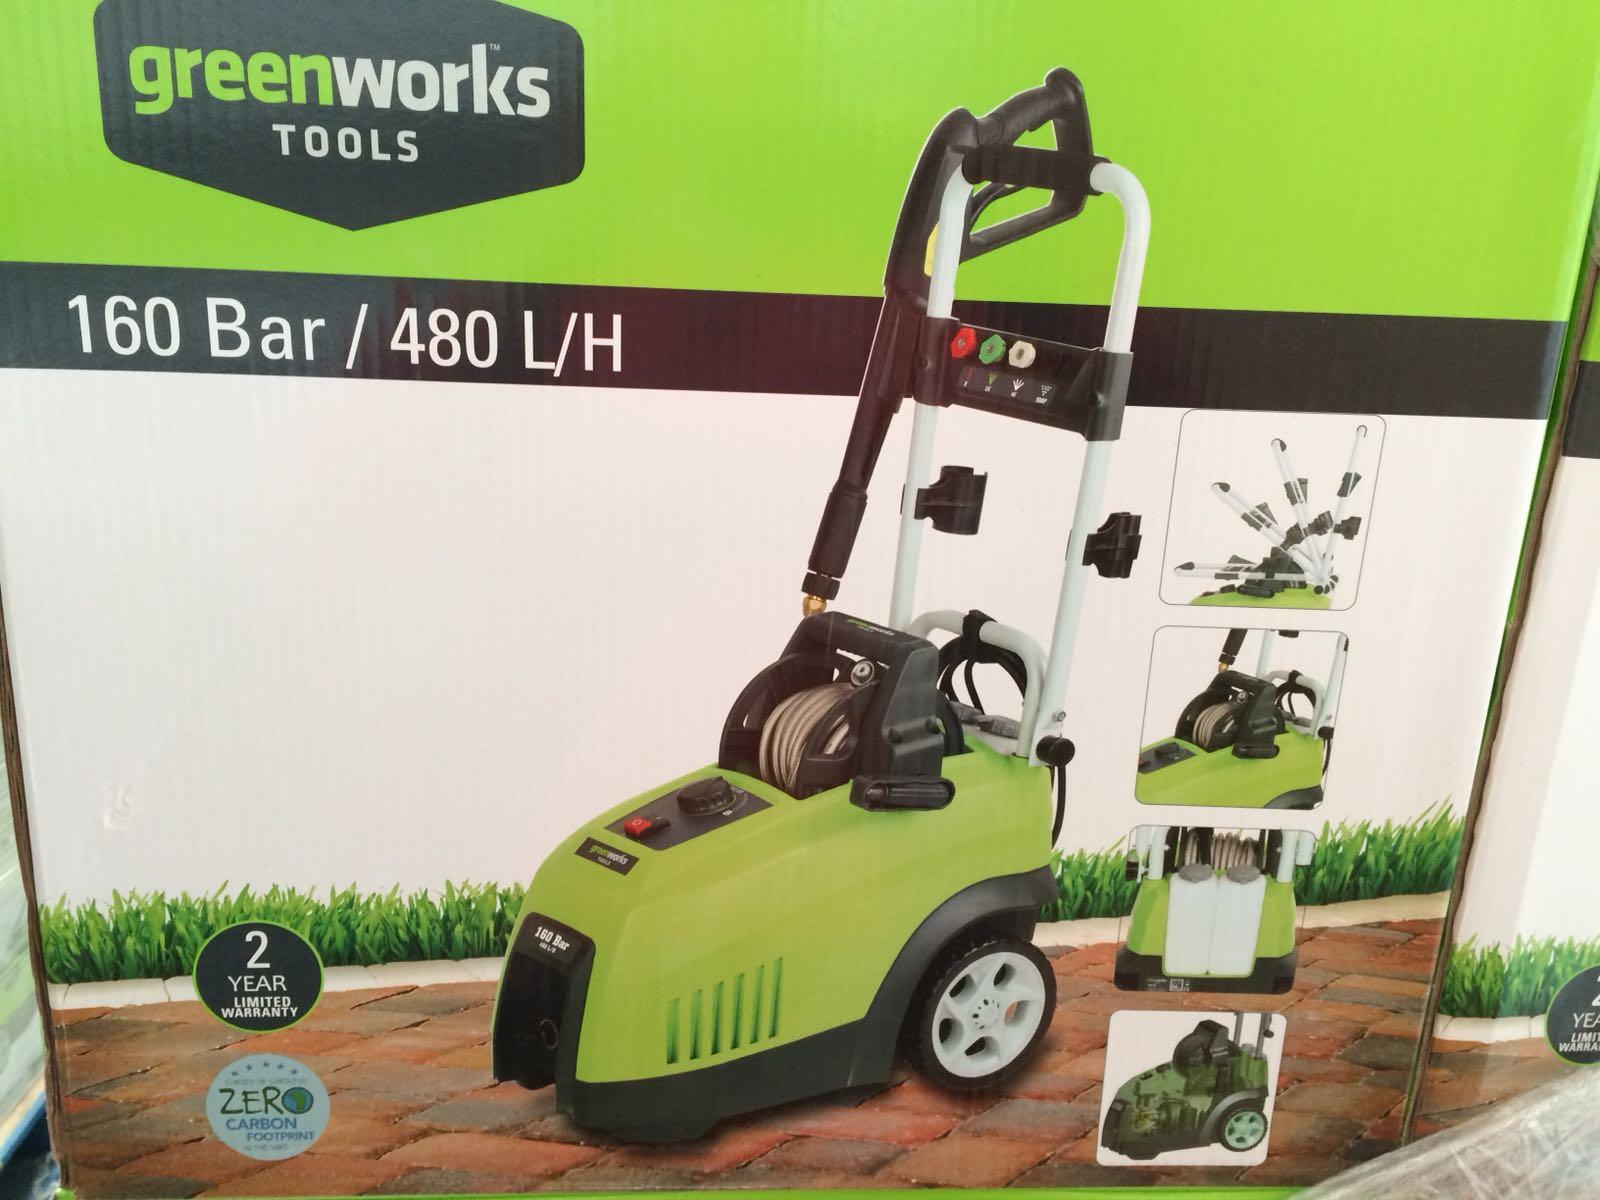 a92108f5cfa1 32079 - Greenworks jetwashers Europe